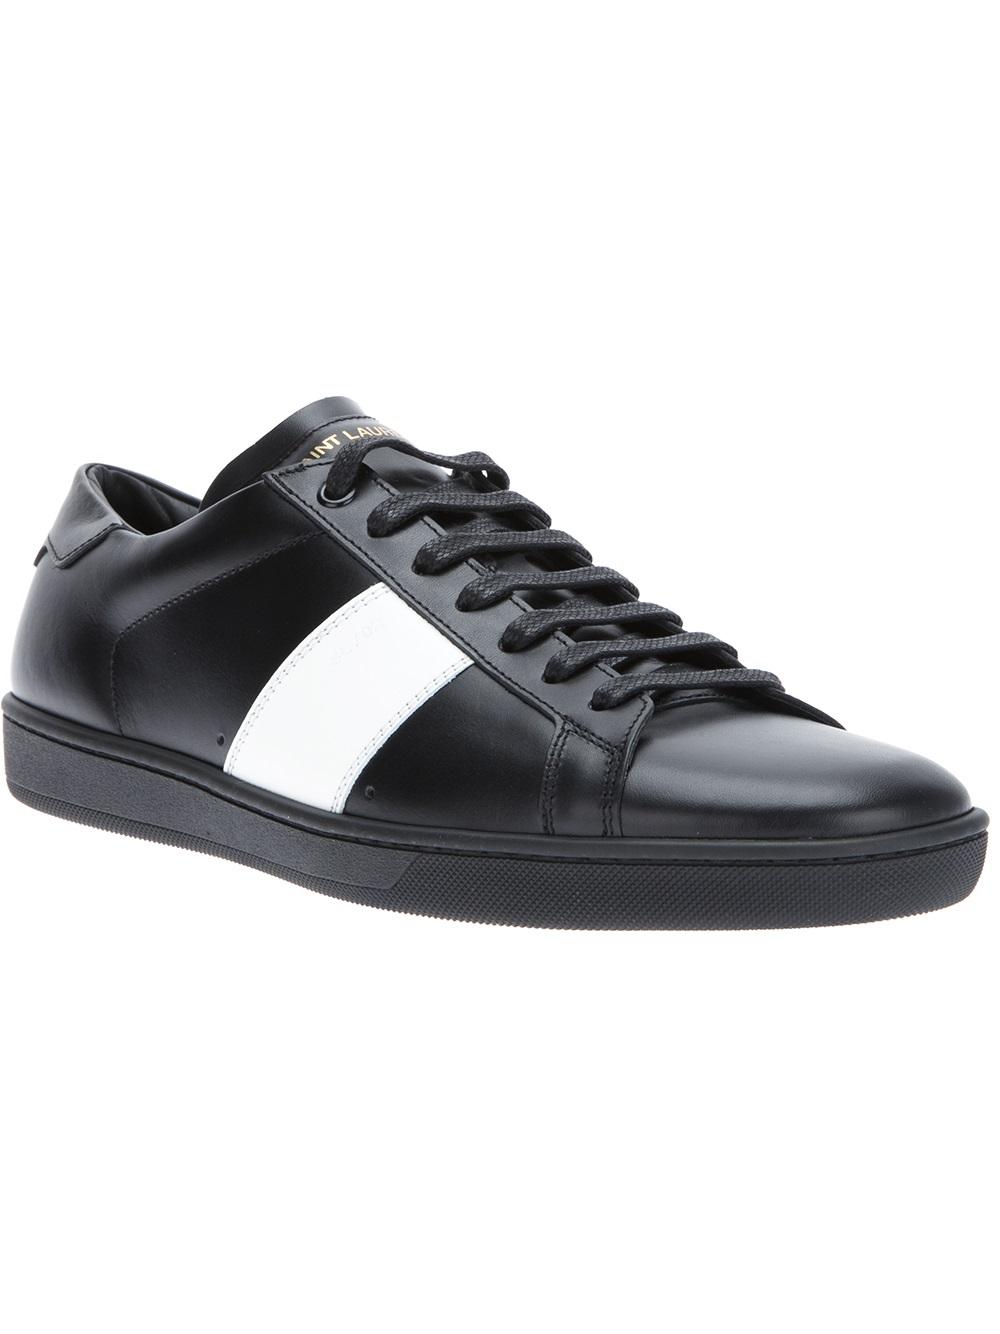 saint laurent wolly sneaker in black for men lyst. Black Bedroom Furniture Sets. Home Design Ideas